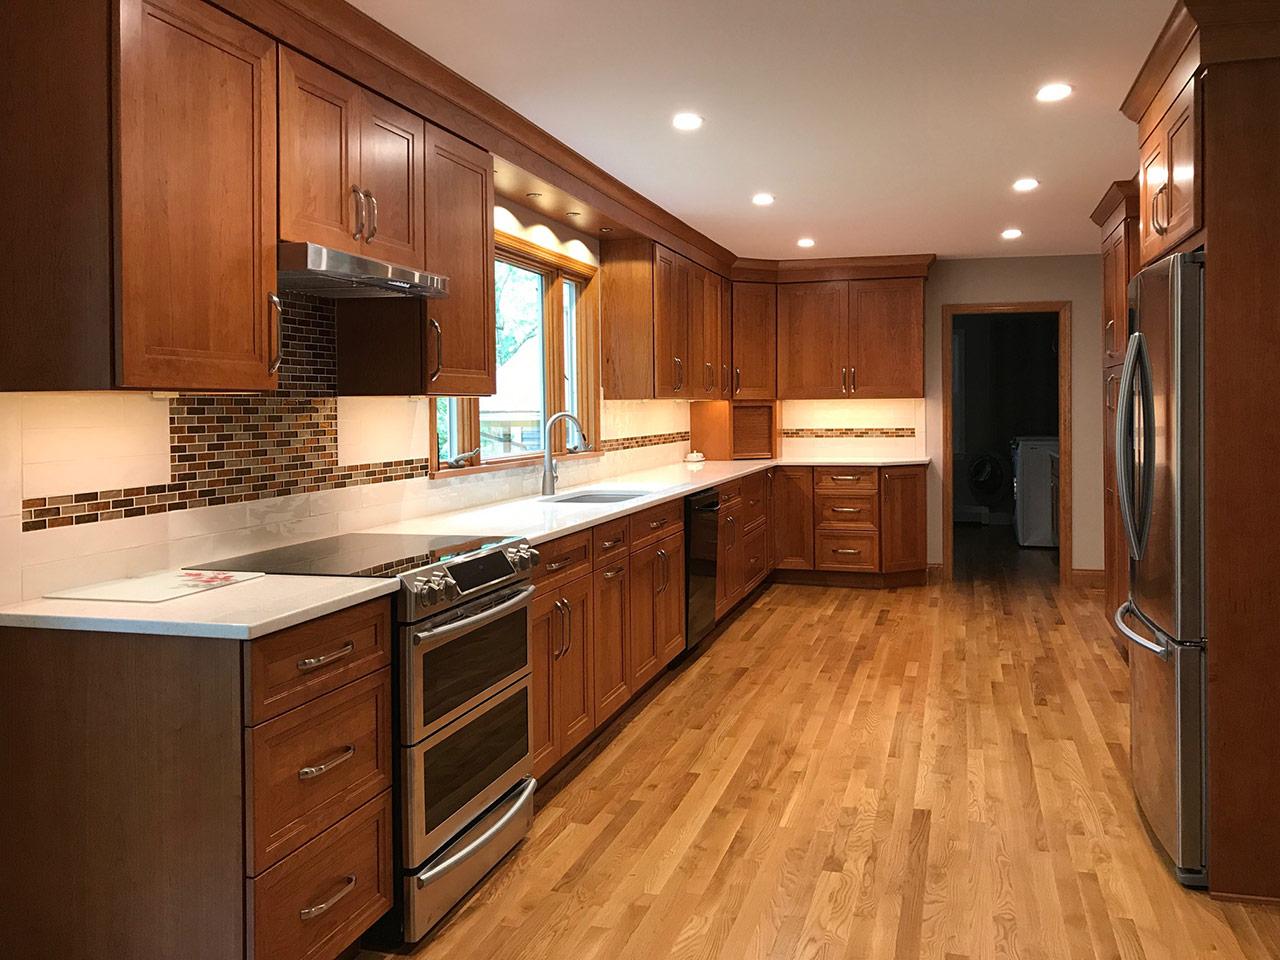 Kitchen Design By Sharon Navarra W Omega Cabinetry